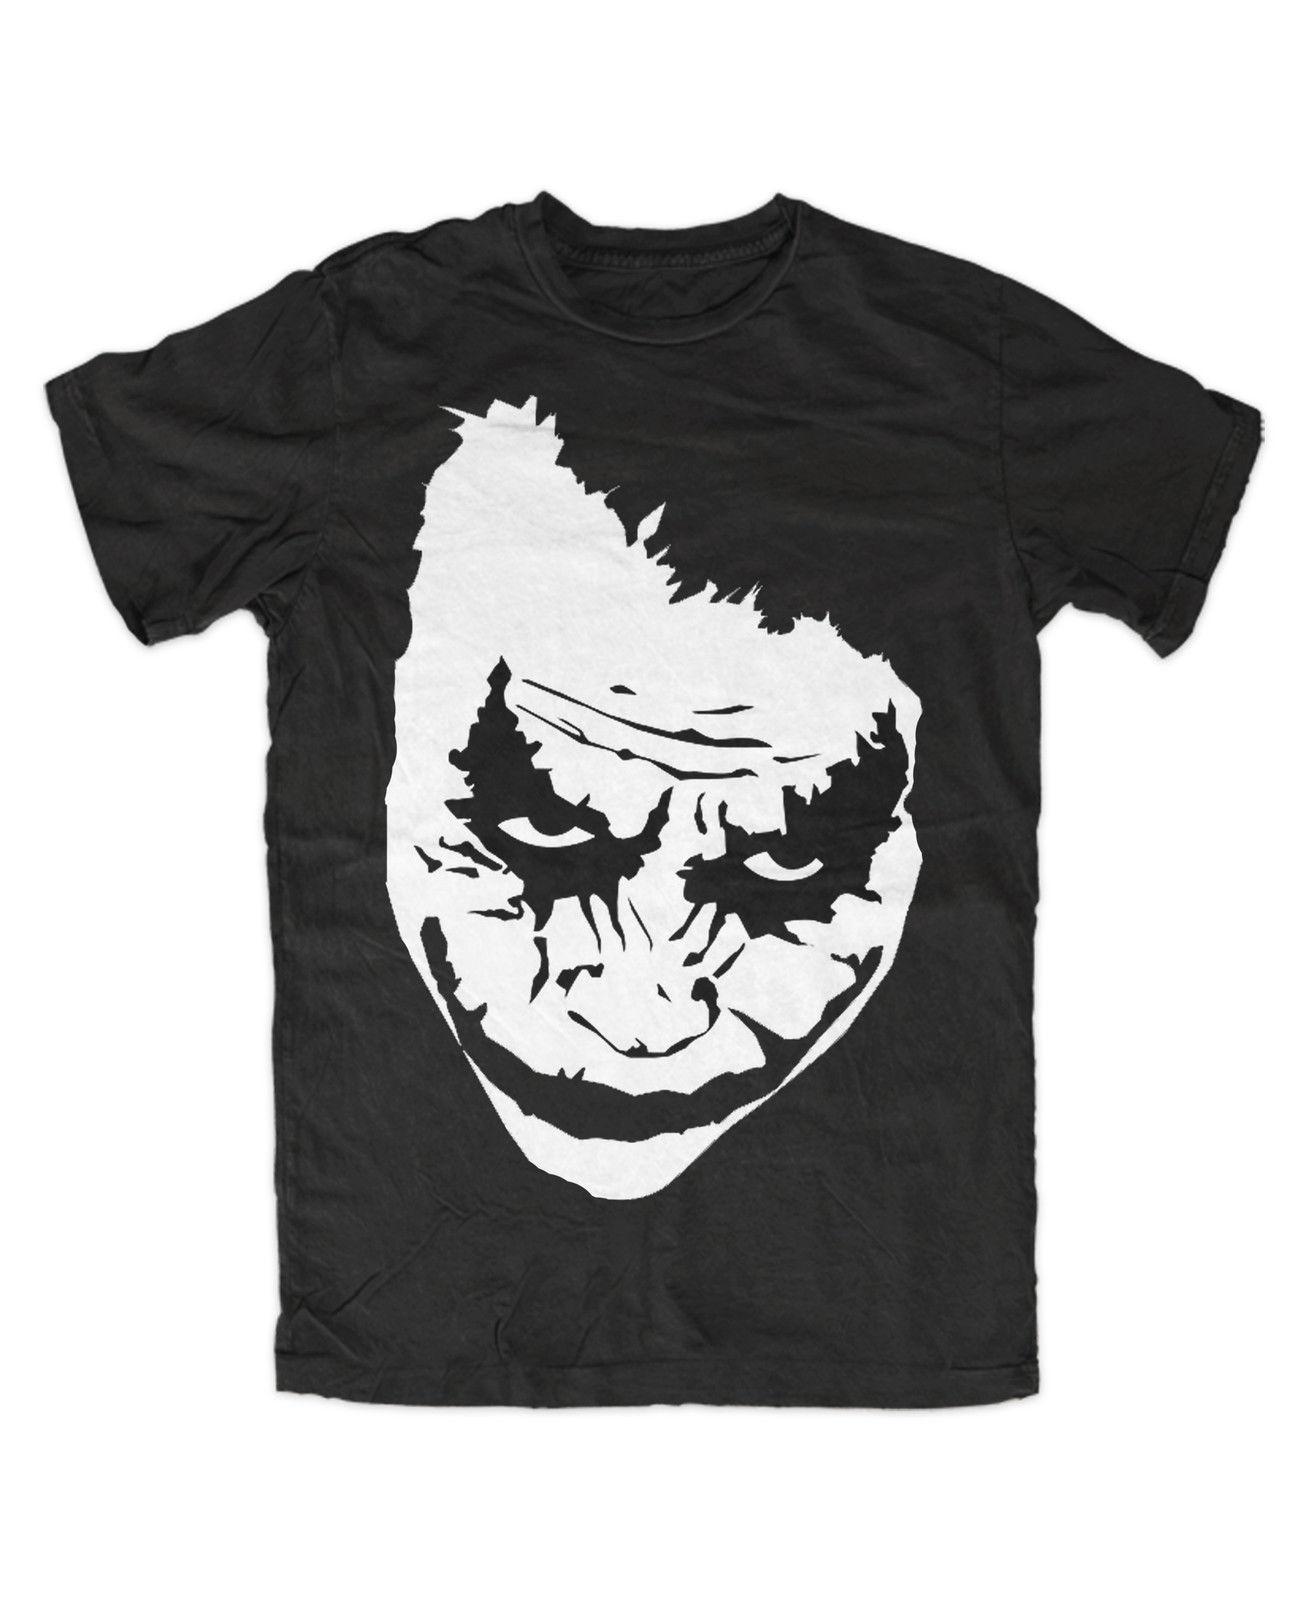 Joker face premium t shirt heath ledger joker why so serious ha ha ha